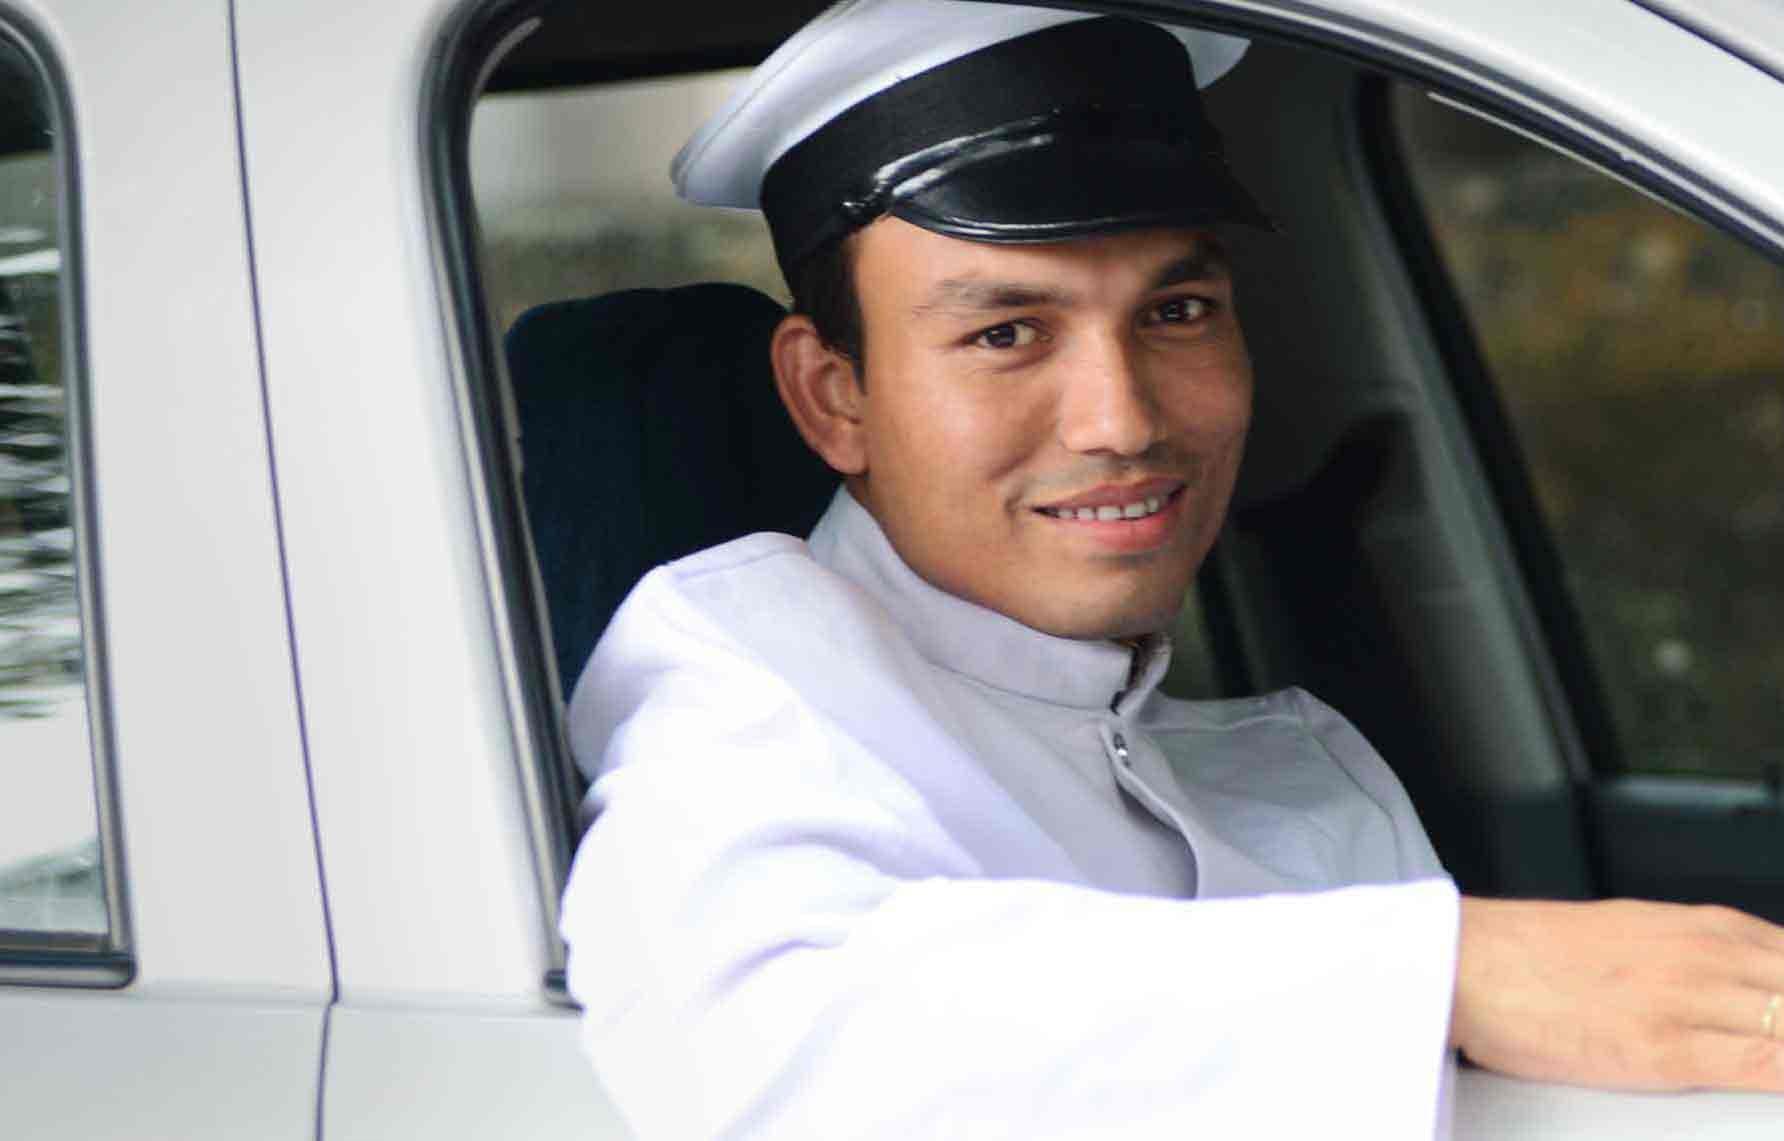 Cab Drivers Job in Australia